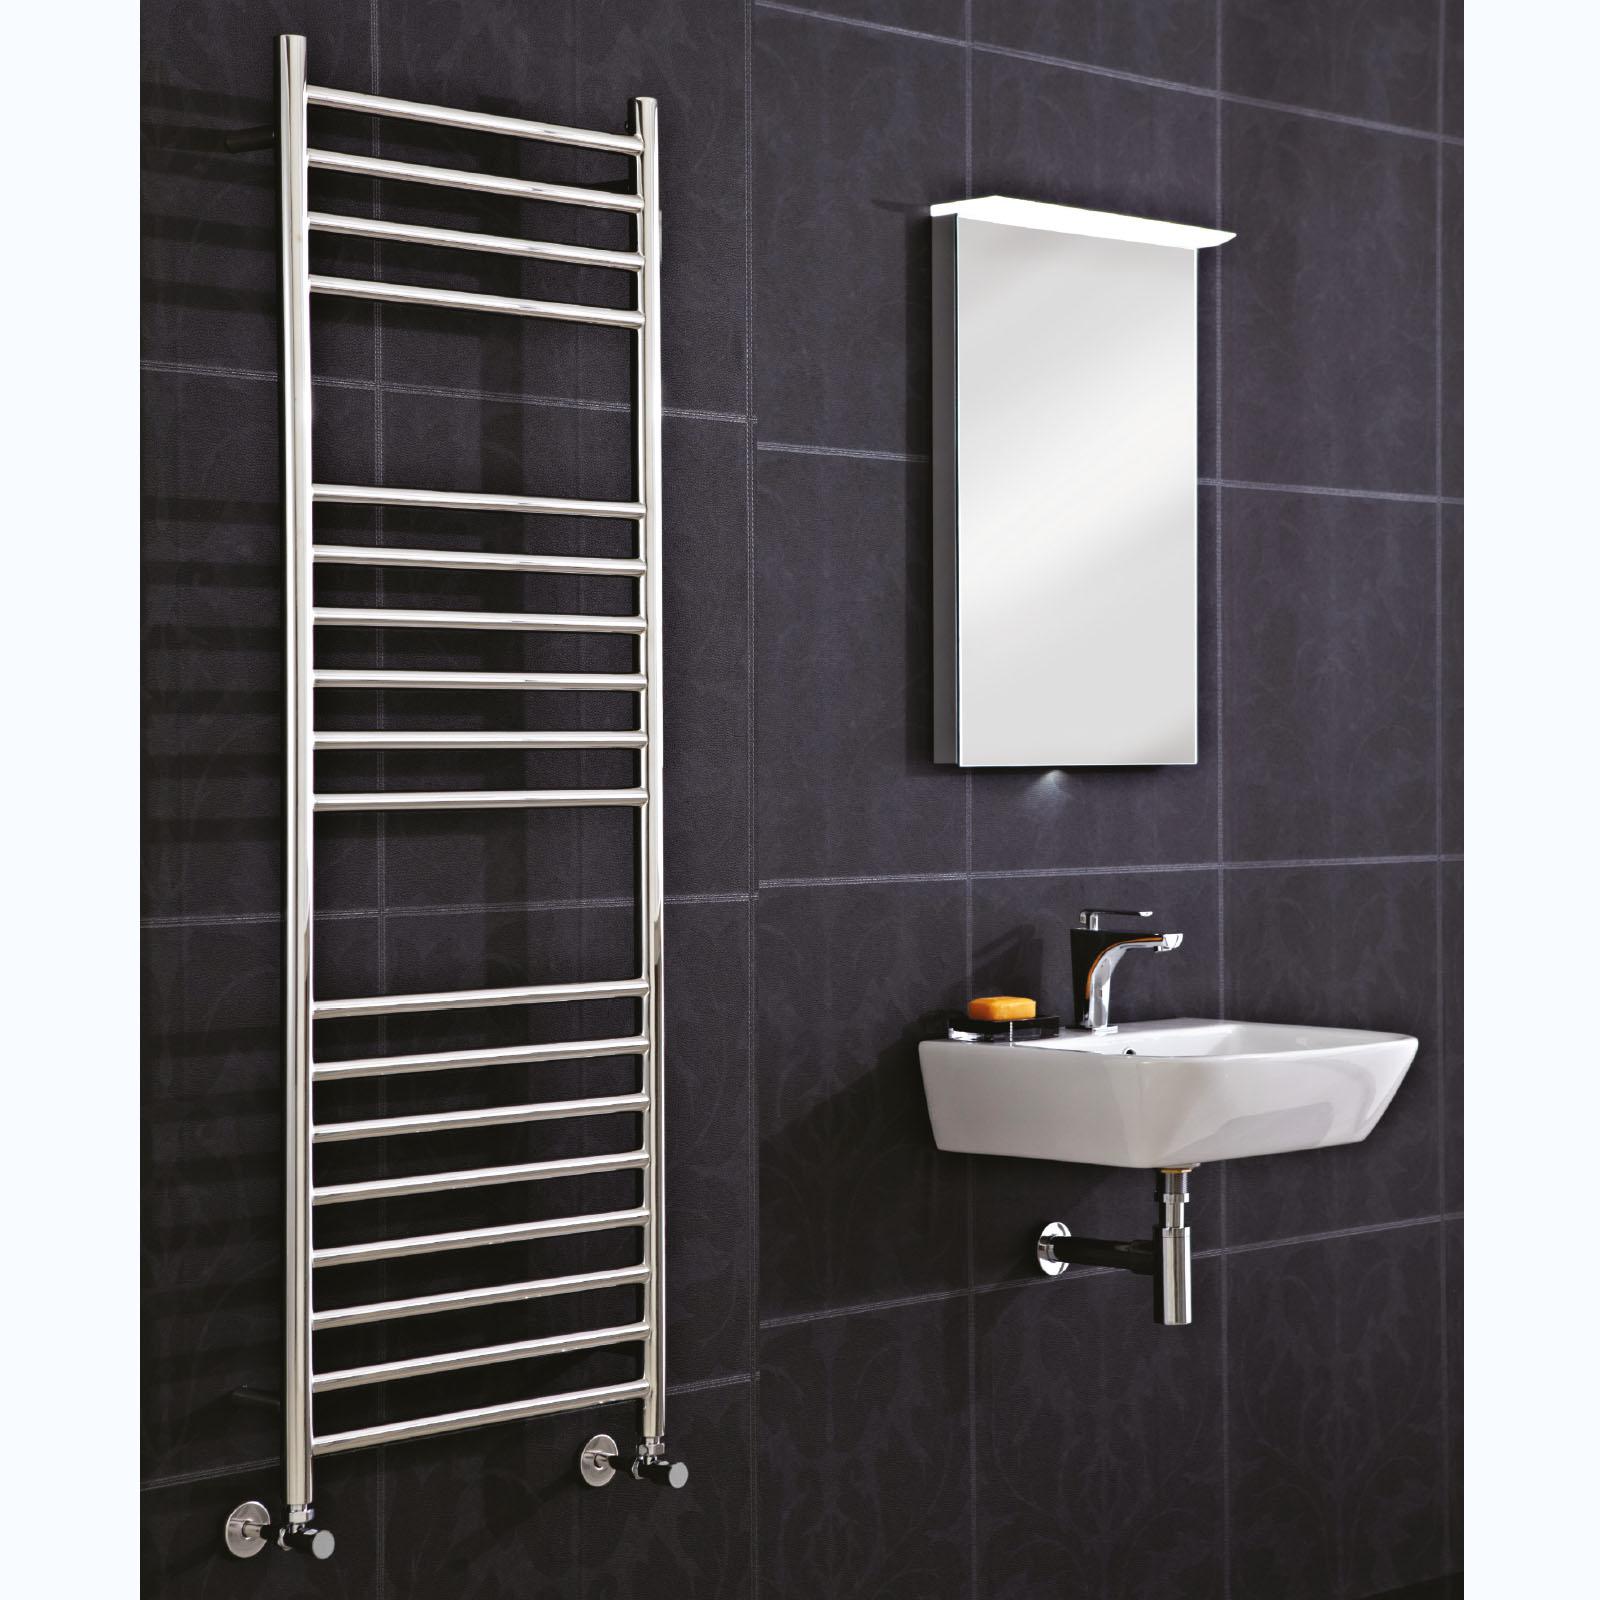 Bathroom Electric Towel Rails Designs Heated Towel